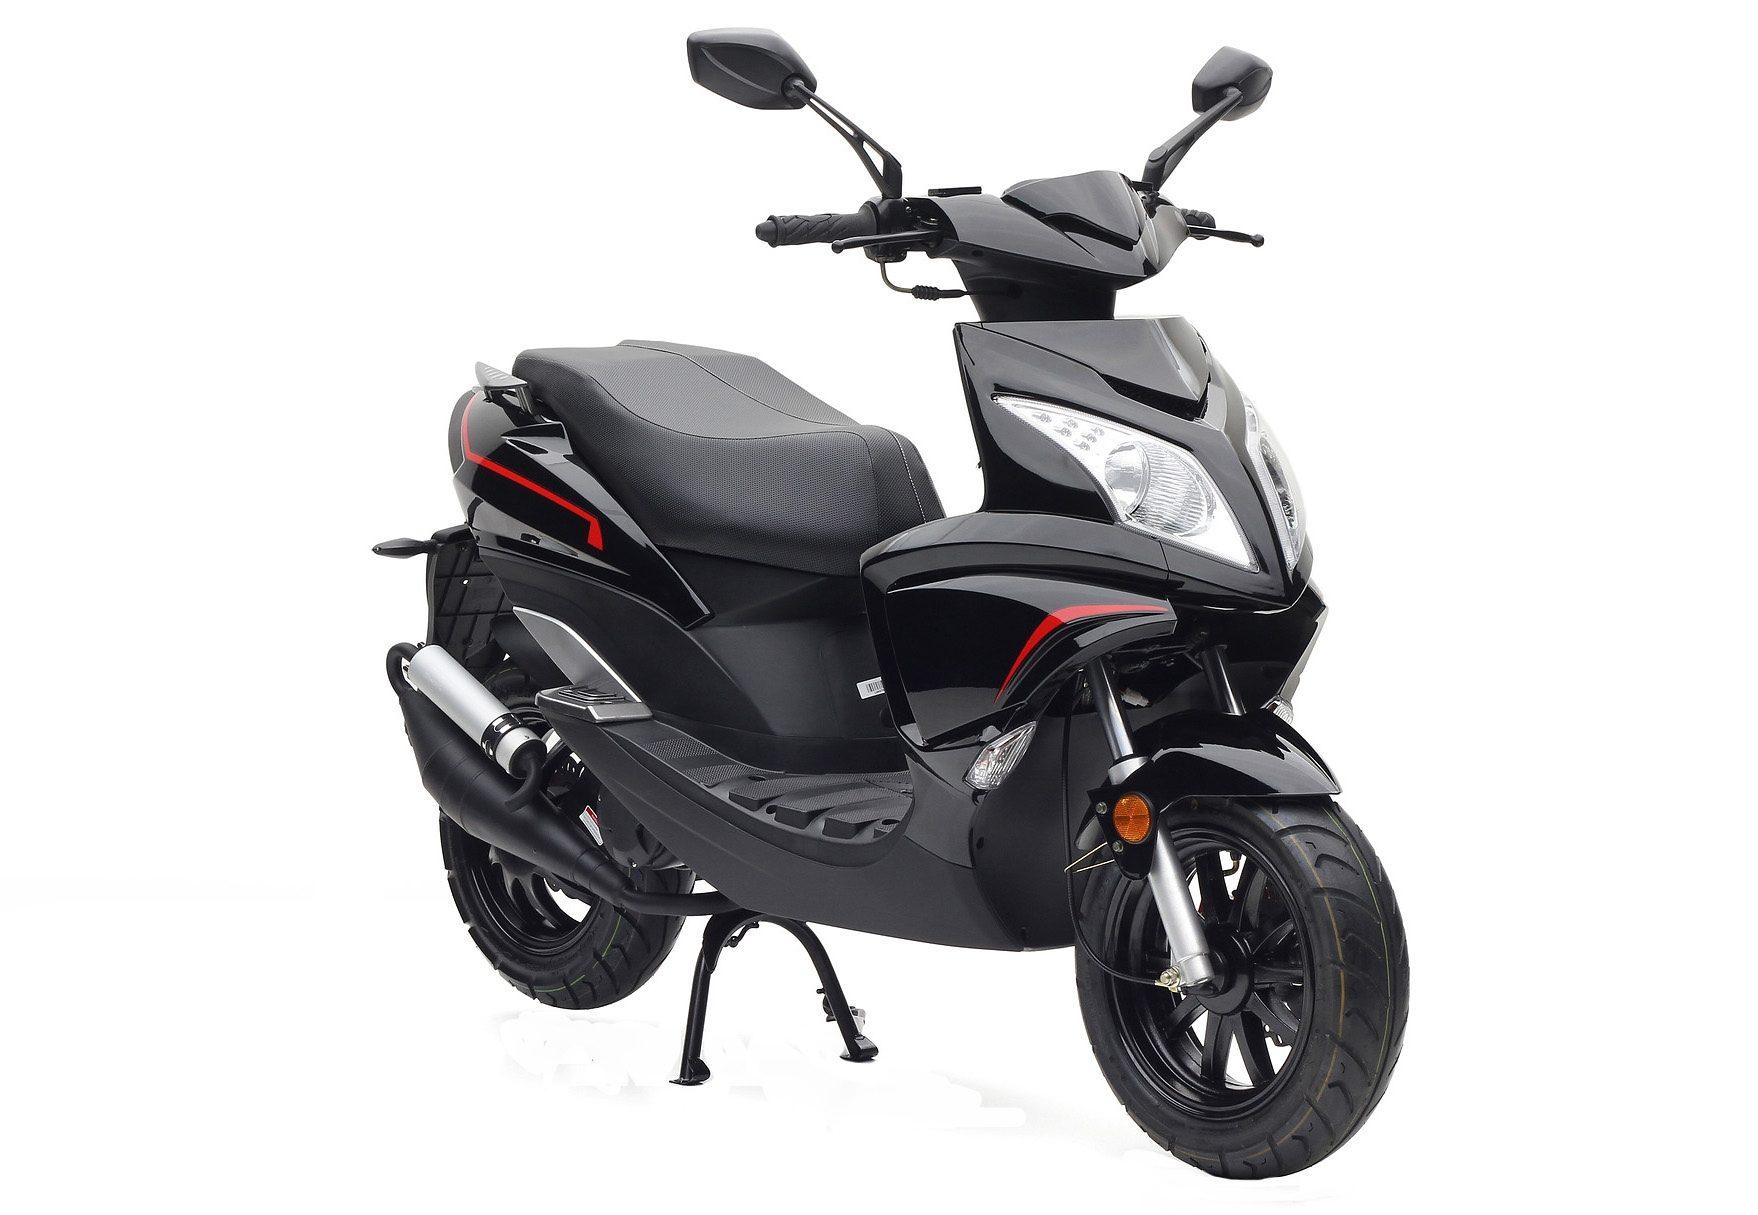 Mofaroller, Nova Motors, »Grido«, 50 ccm 25 km/h, schwarz